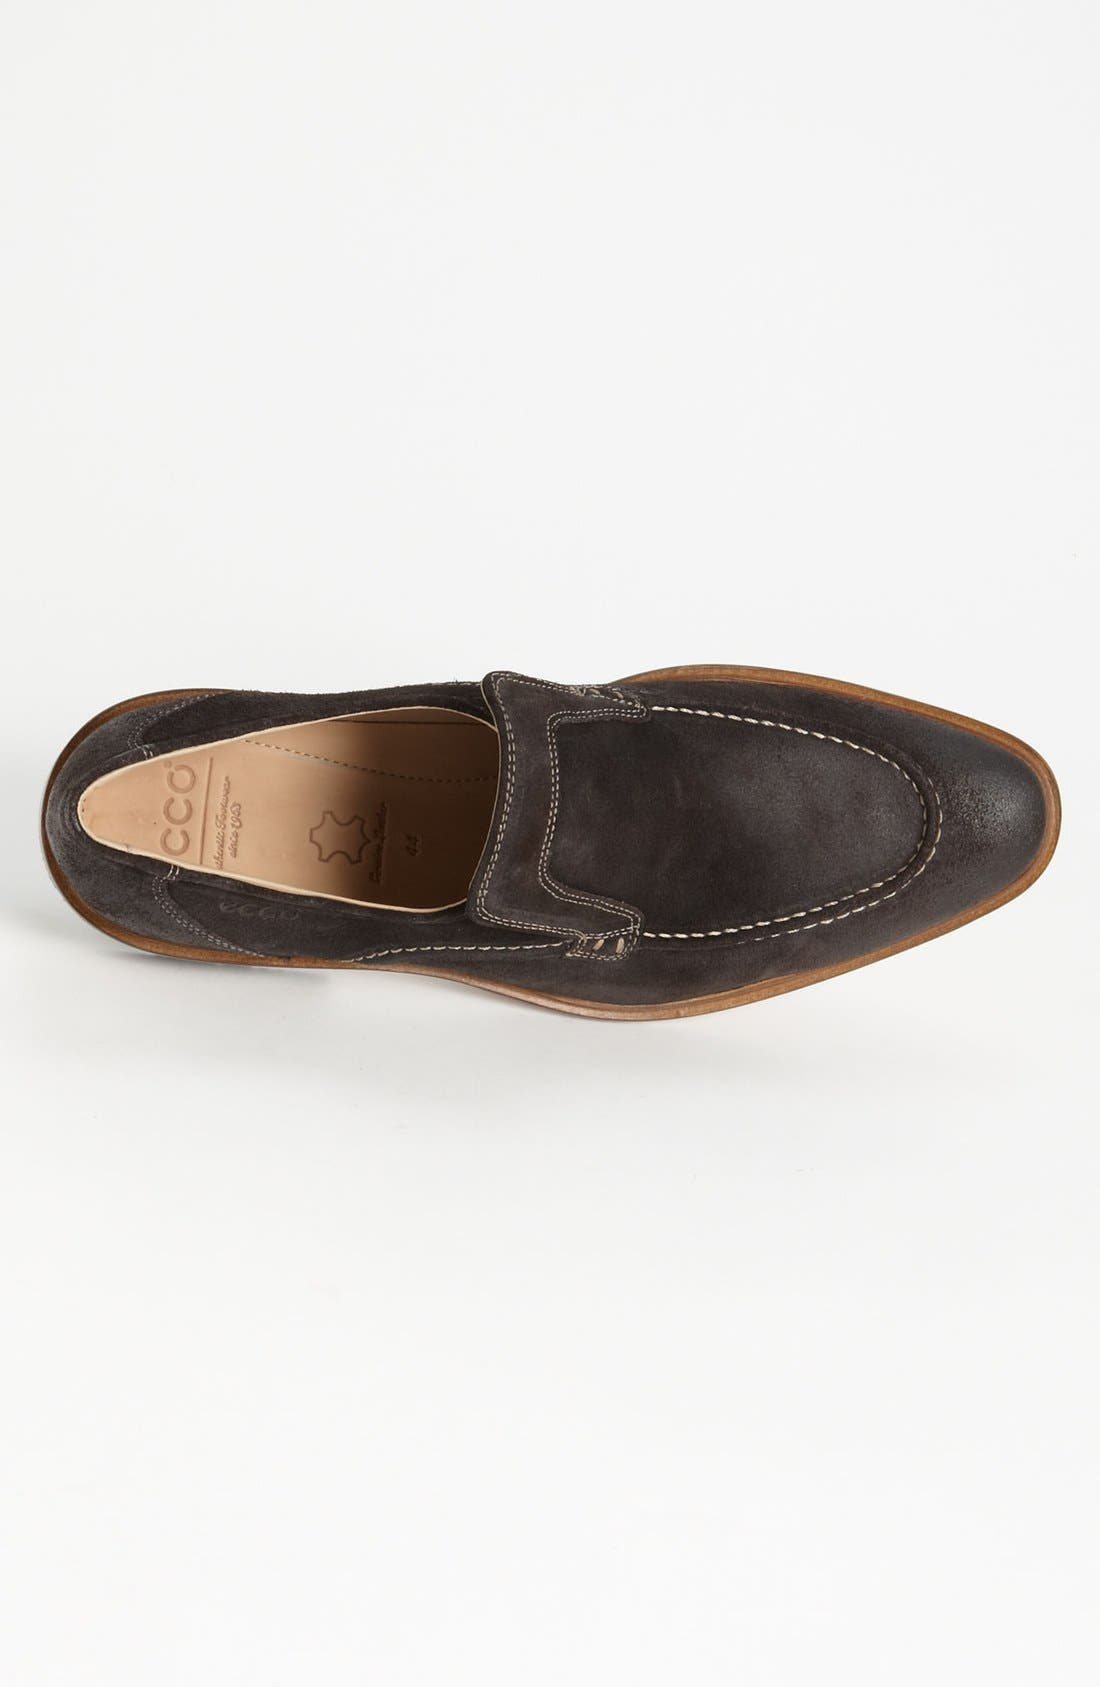 Alternate Image 3  - ECCO 'Pedoso' Venetian Loafer (Men)